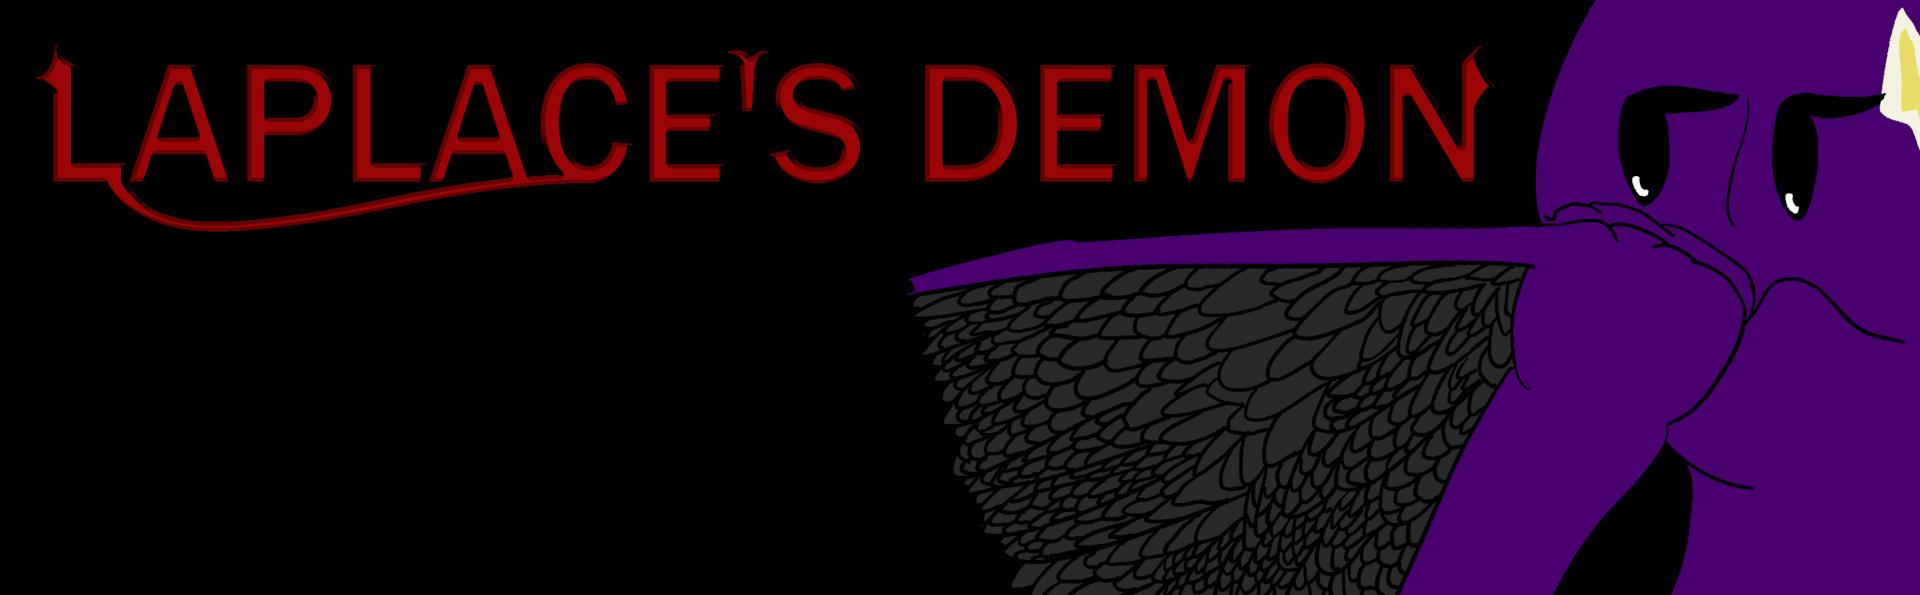 Laplace's Demon is Bored